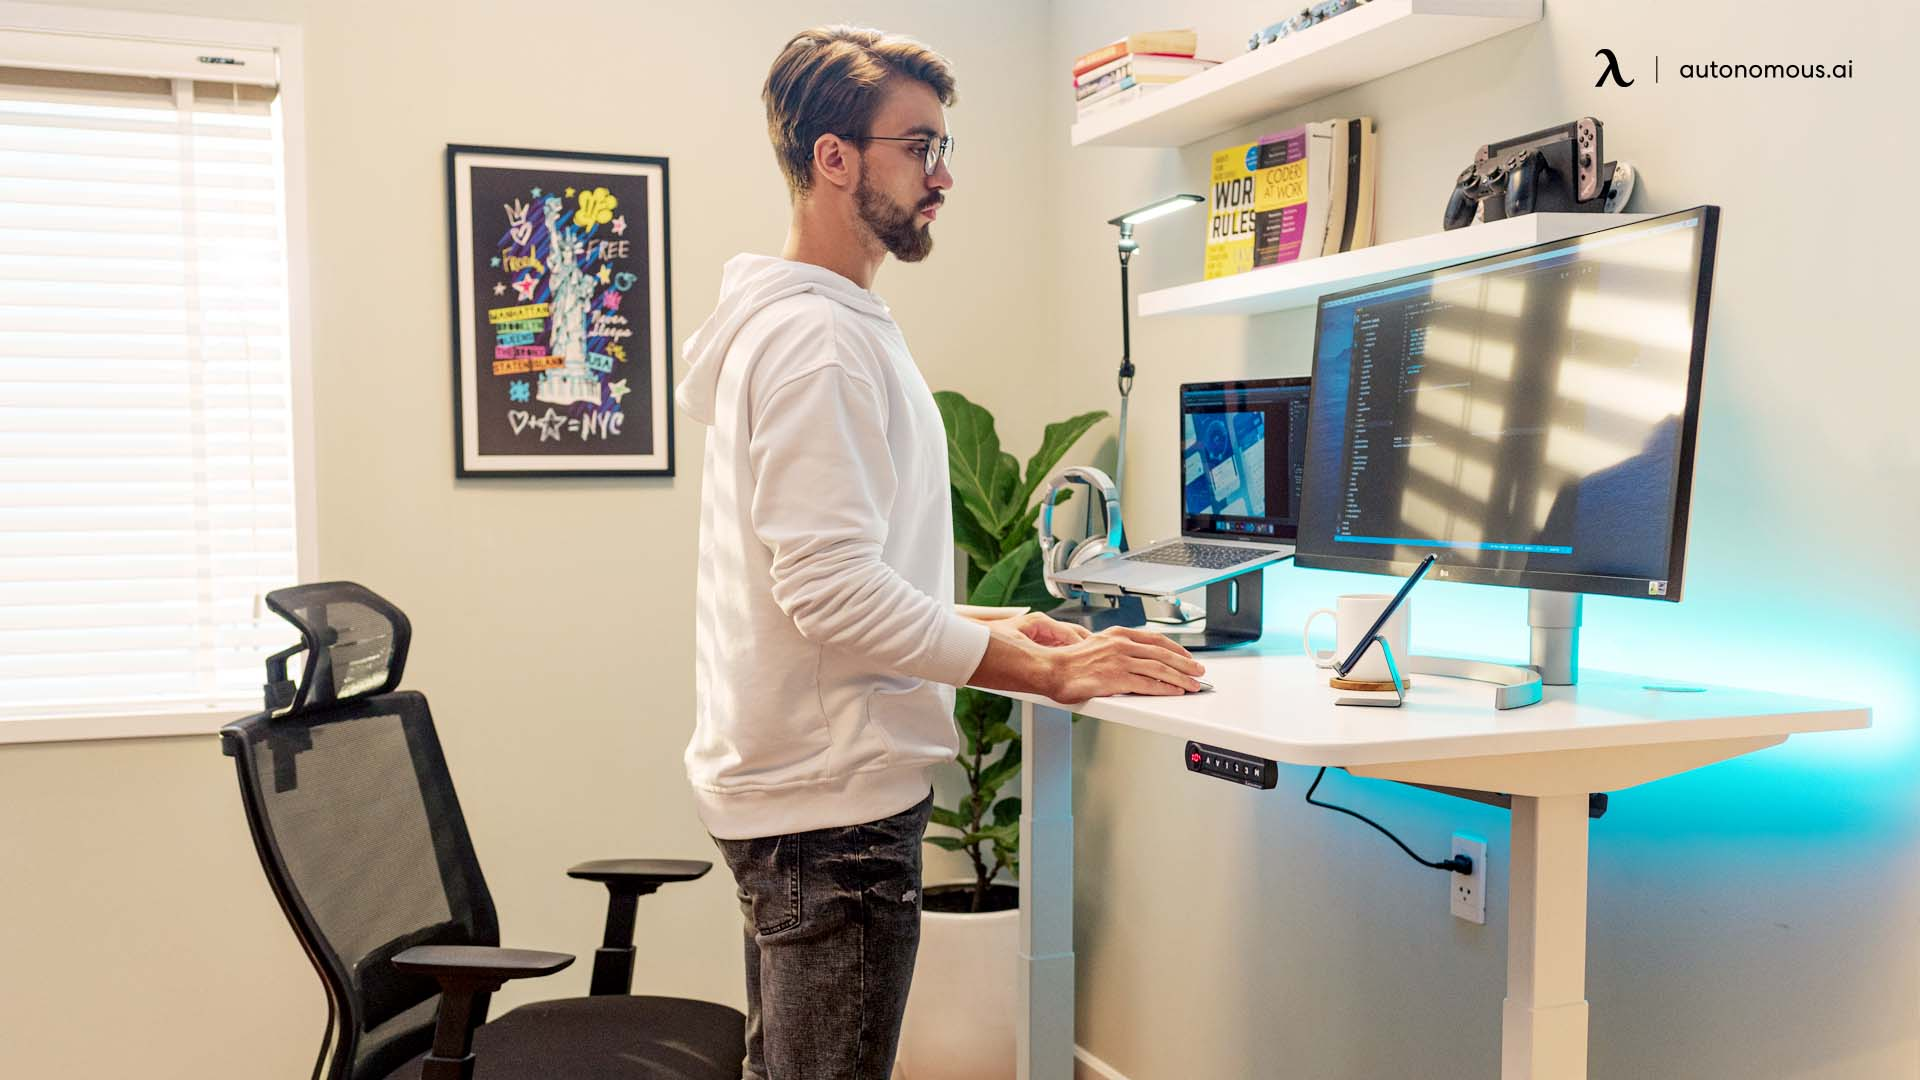 Ergonomic and Hybrid workspace solution